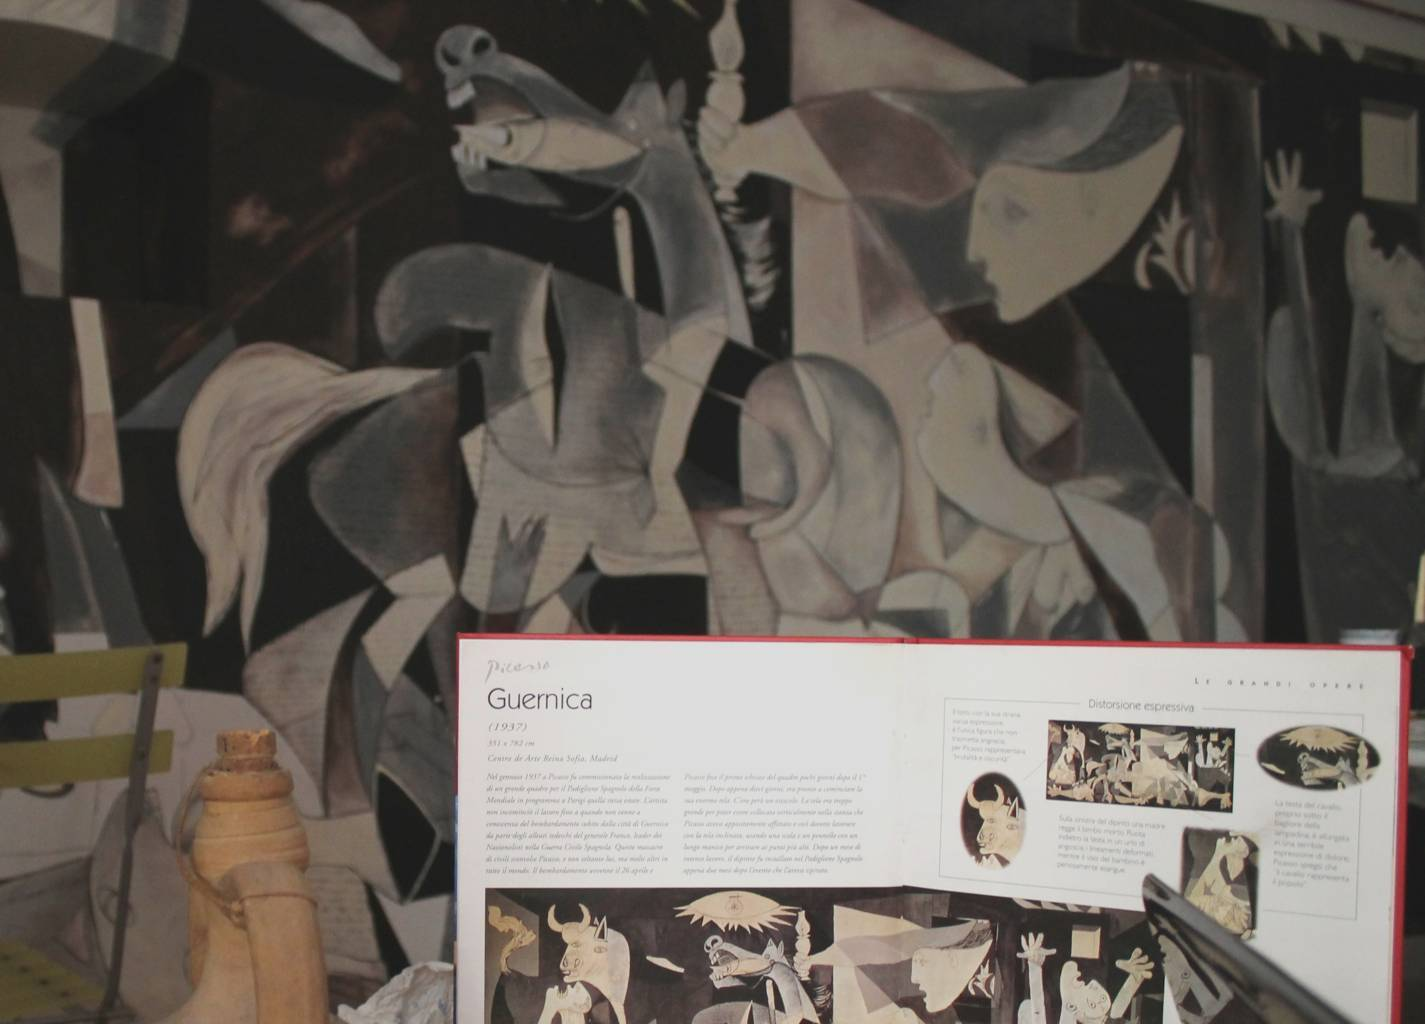 GuernicaBeltempo-latina24ore-130